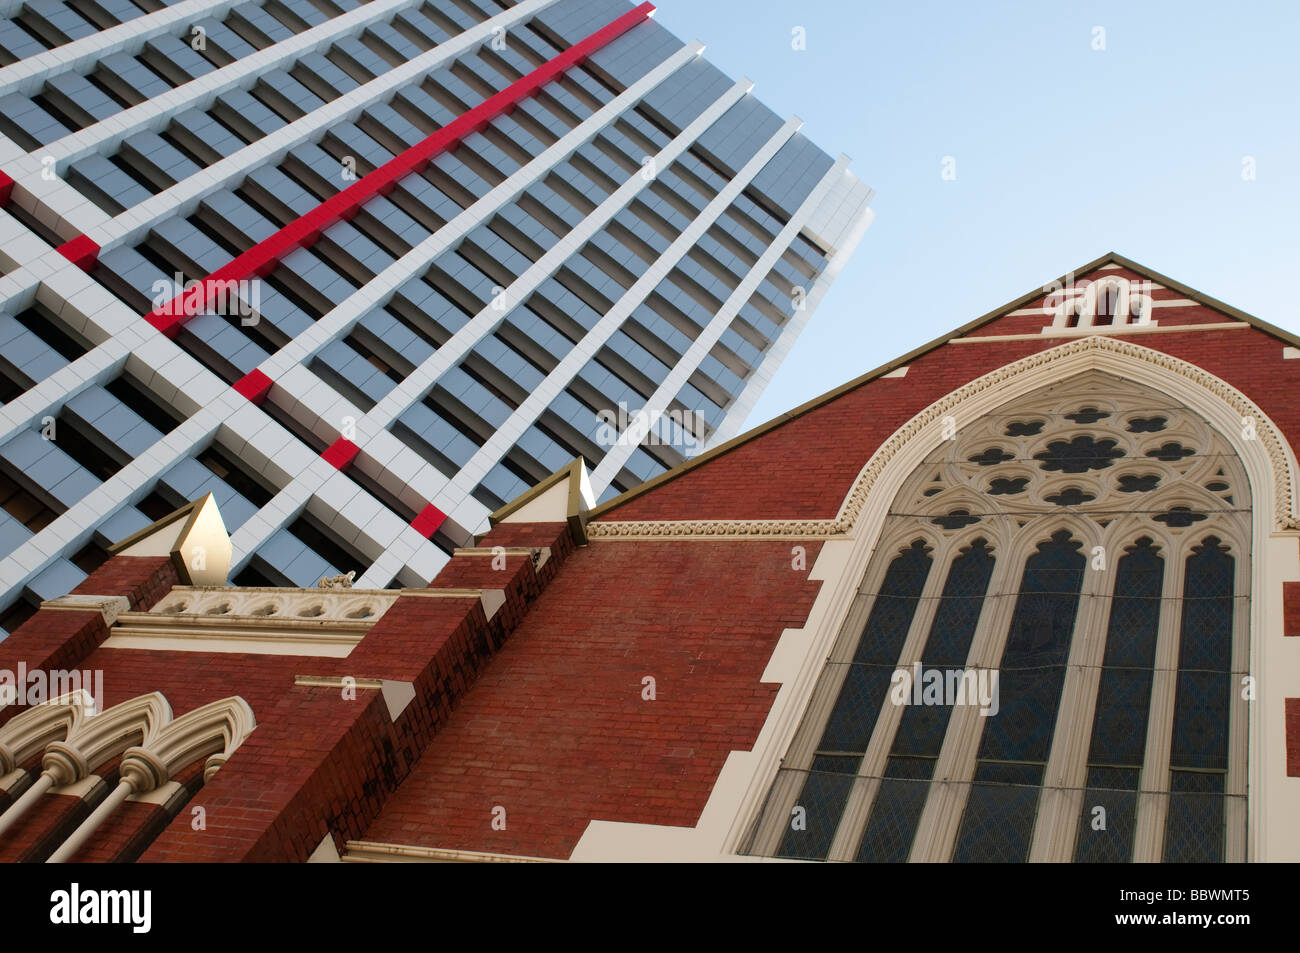 Albert Street Uniting Church in Brisbane Queensland Australia - Stock Image